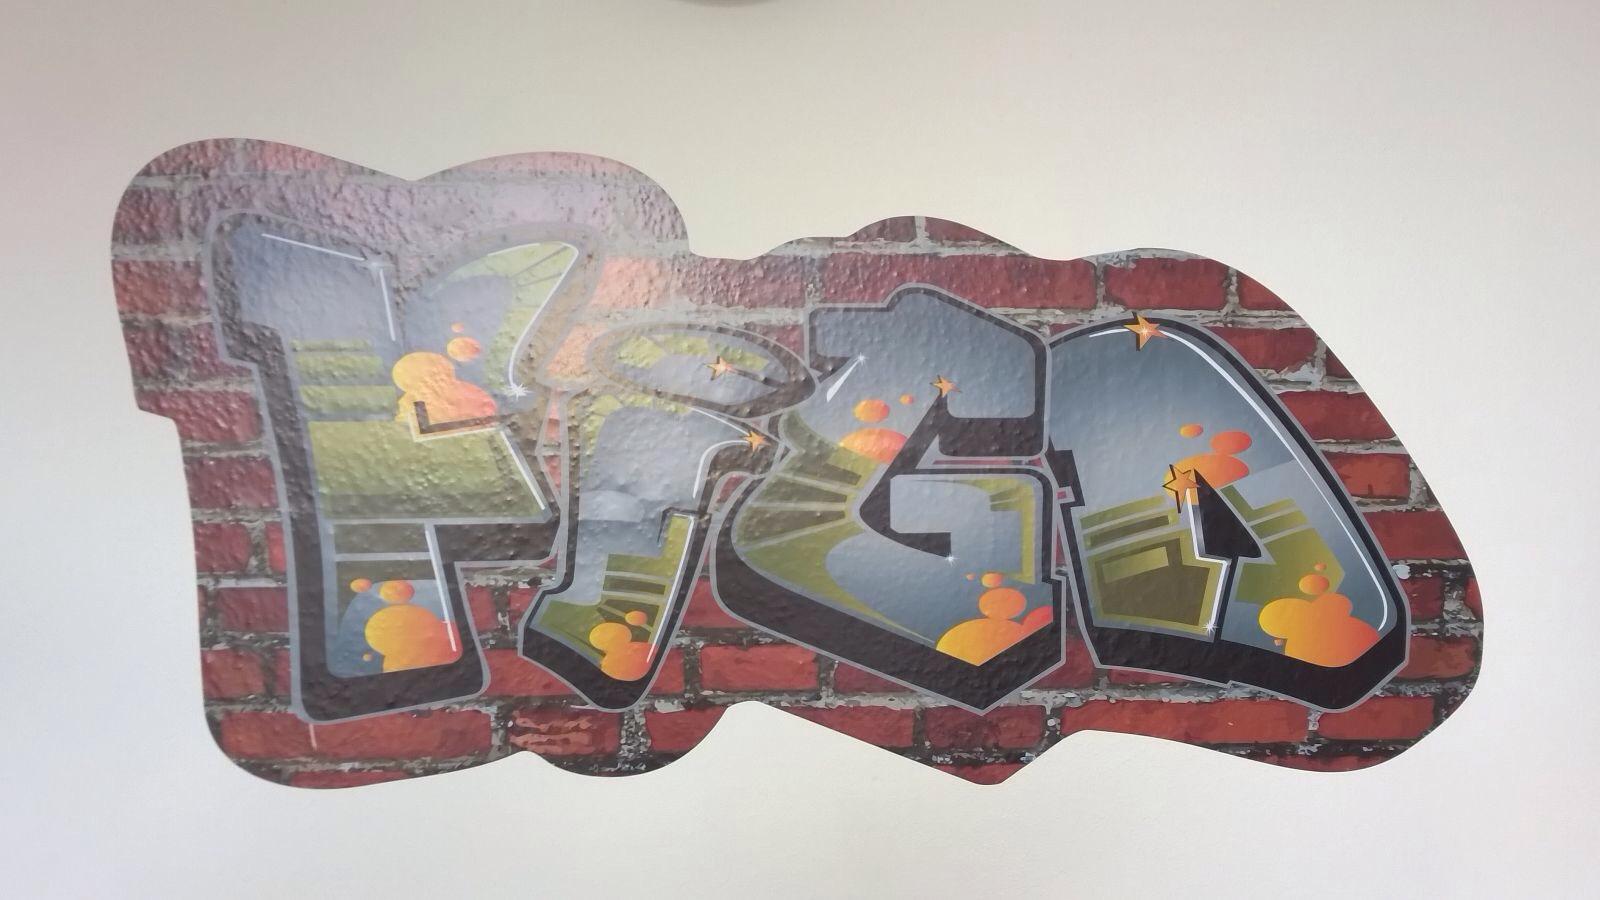 StickerOp - Muursticker graffiti op stenen muur - Stefan